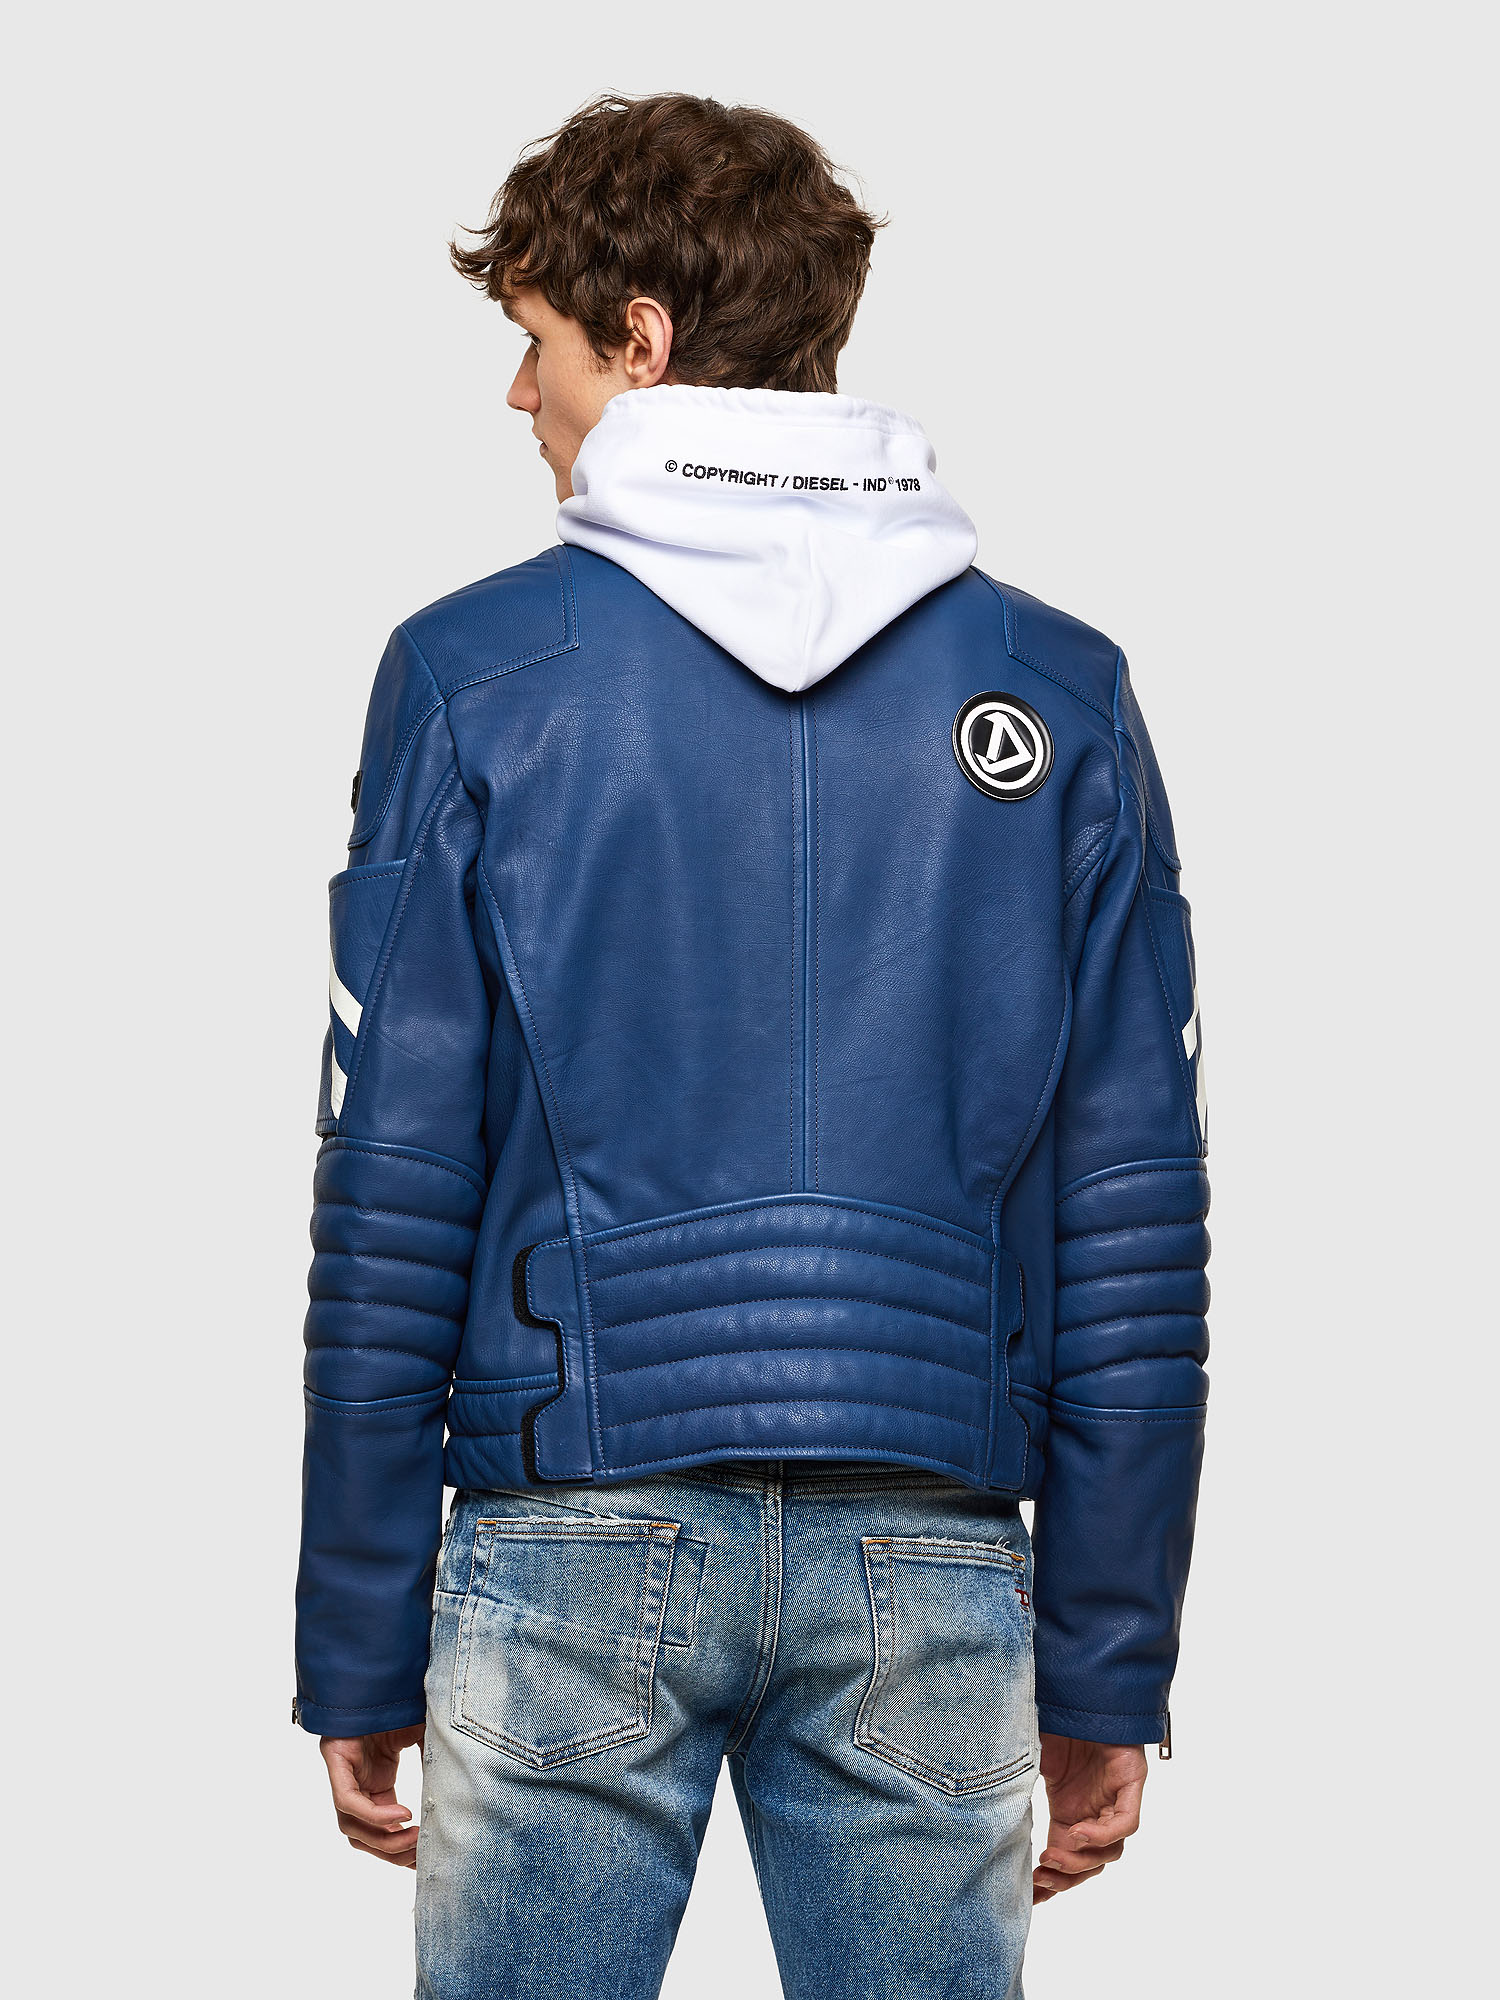 Diesel - L-FULK, Blue - Leather jackets - Image 2